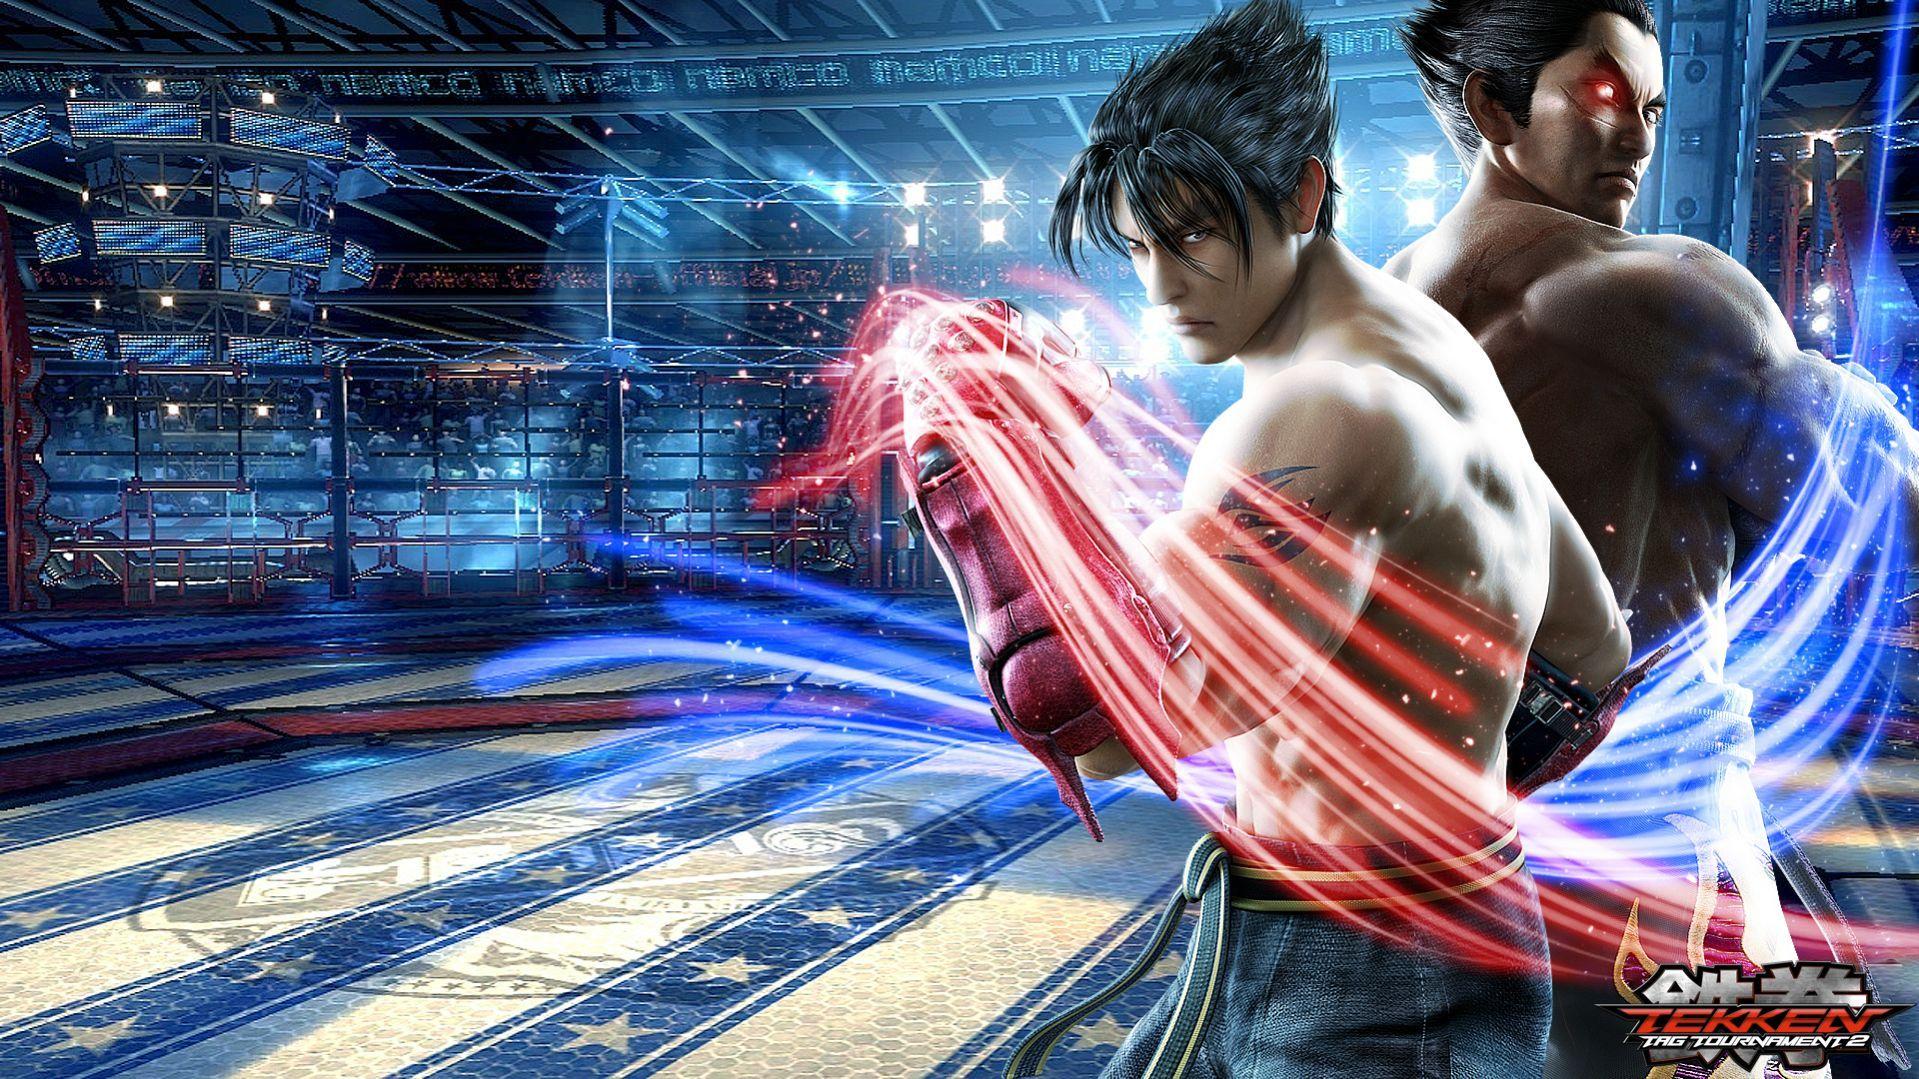 Tekken Tag Tournament Lars Wallpaper By ElvinJomar On DeviantArt 900x506 2 Wallpapers 51